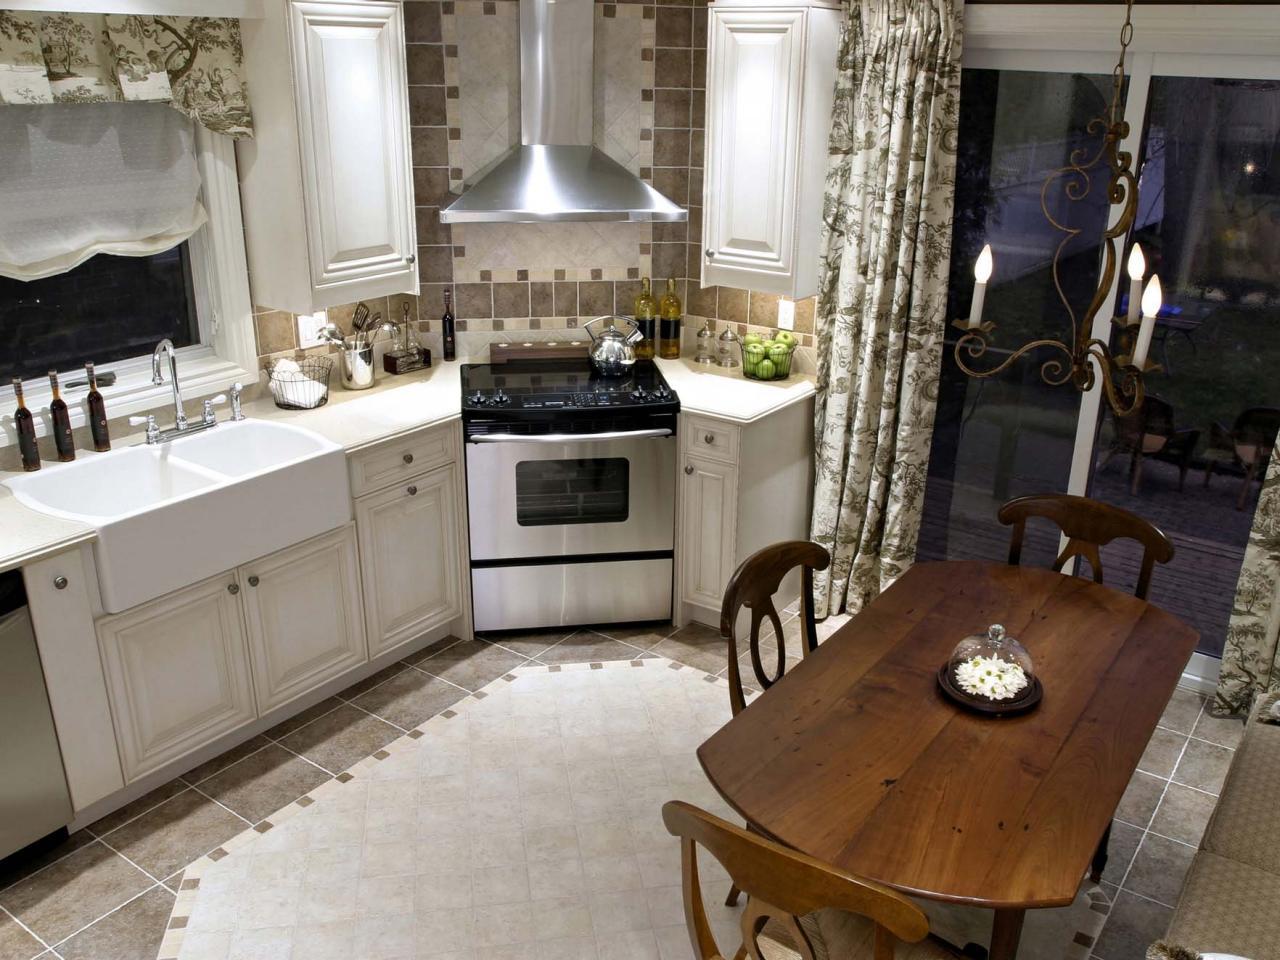 candice olson kitchen cabinets photo - 3